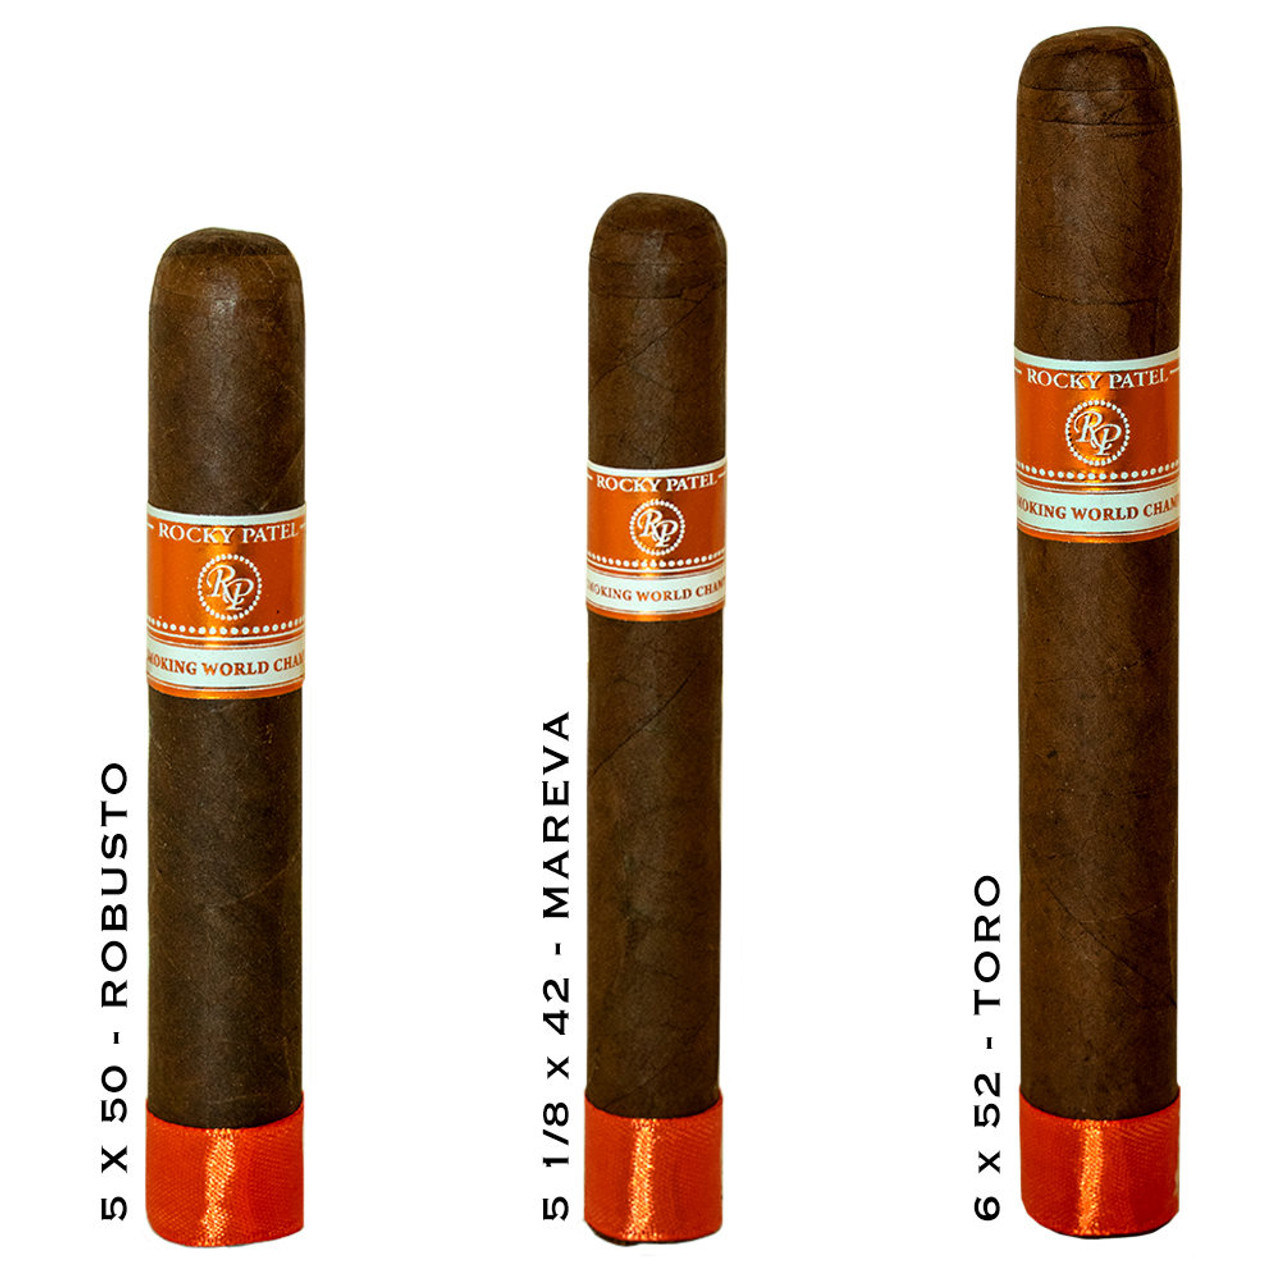 Rocky Patel - Cigar Smoking World Championship